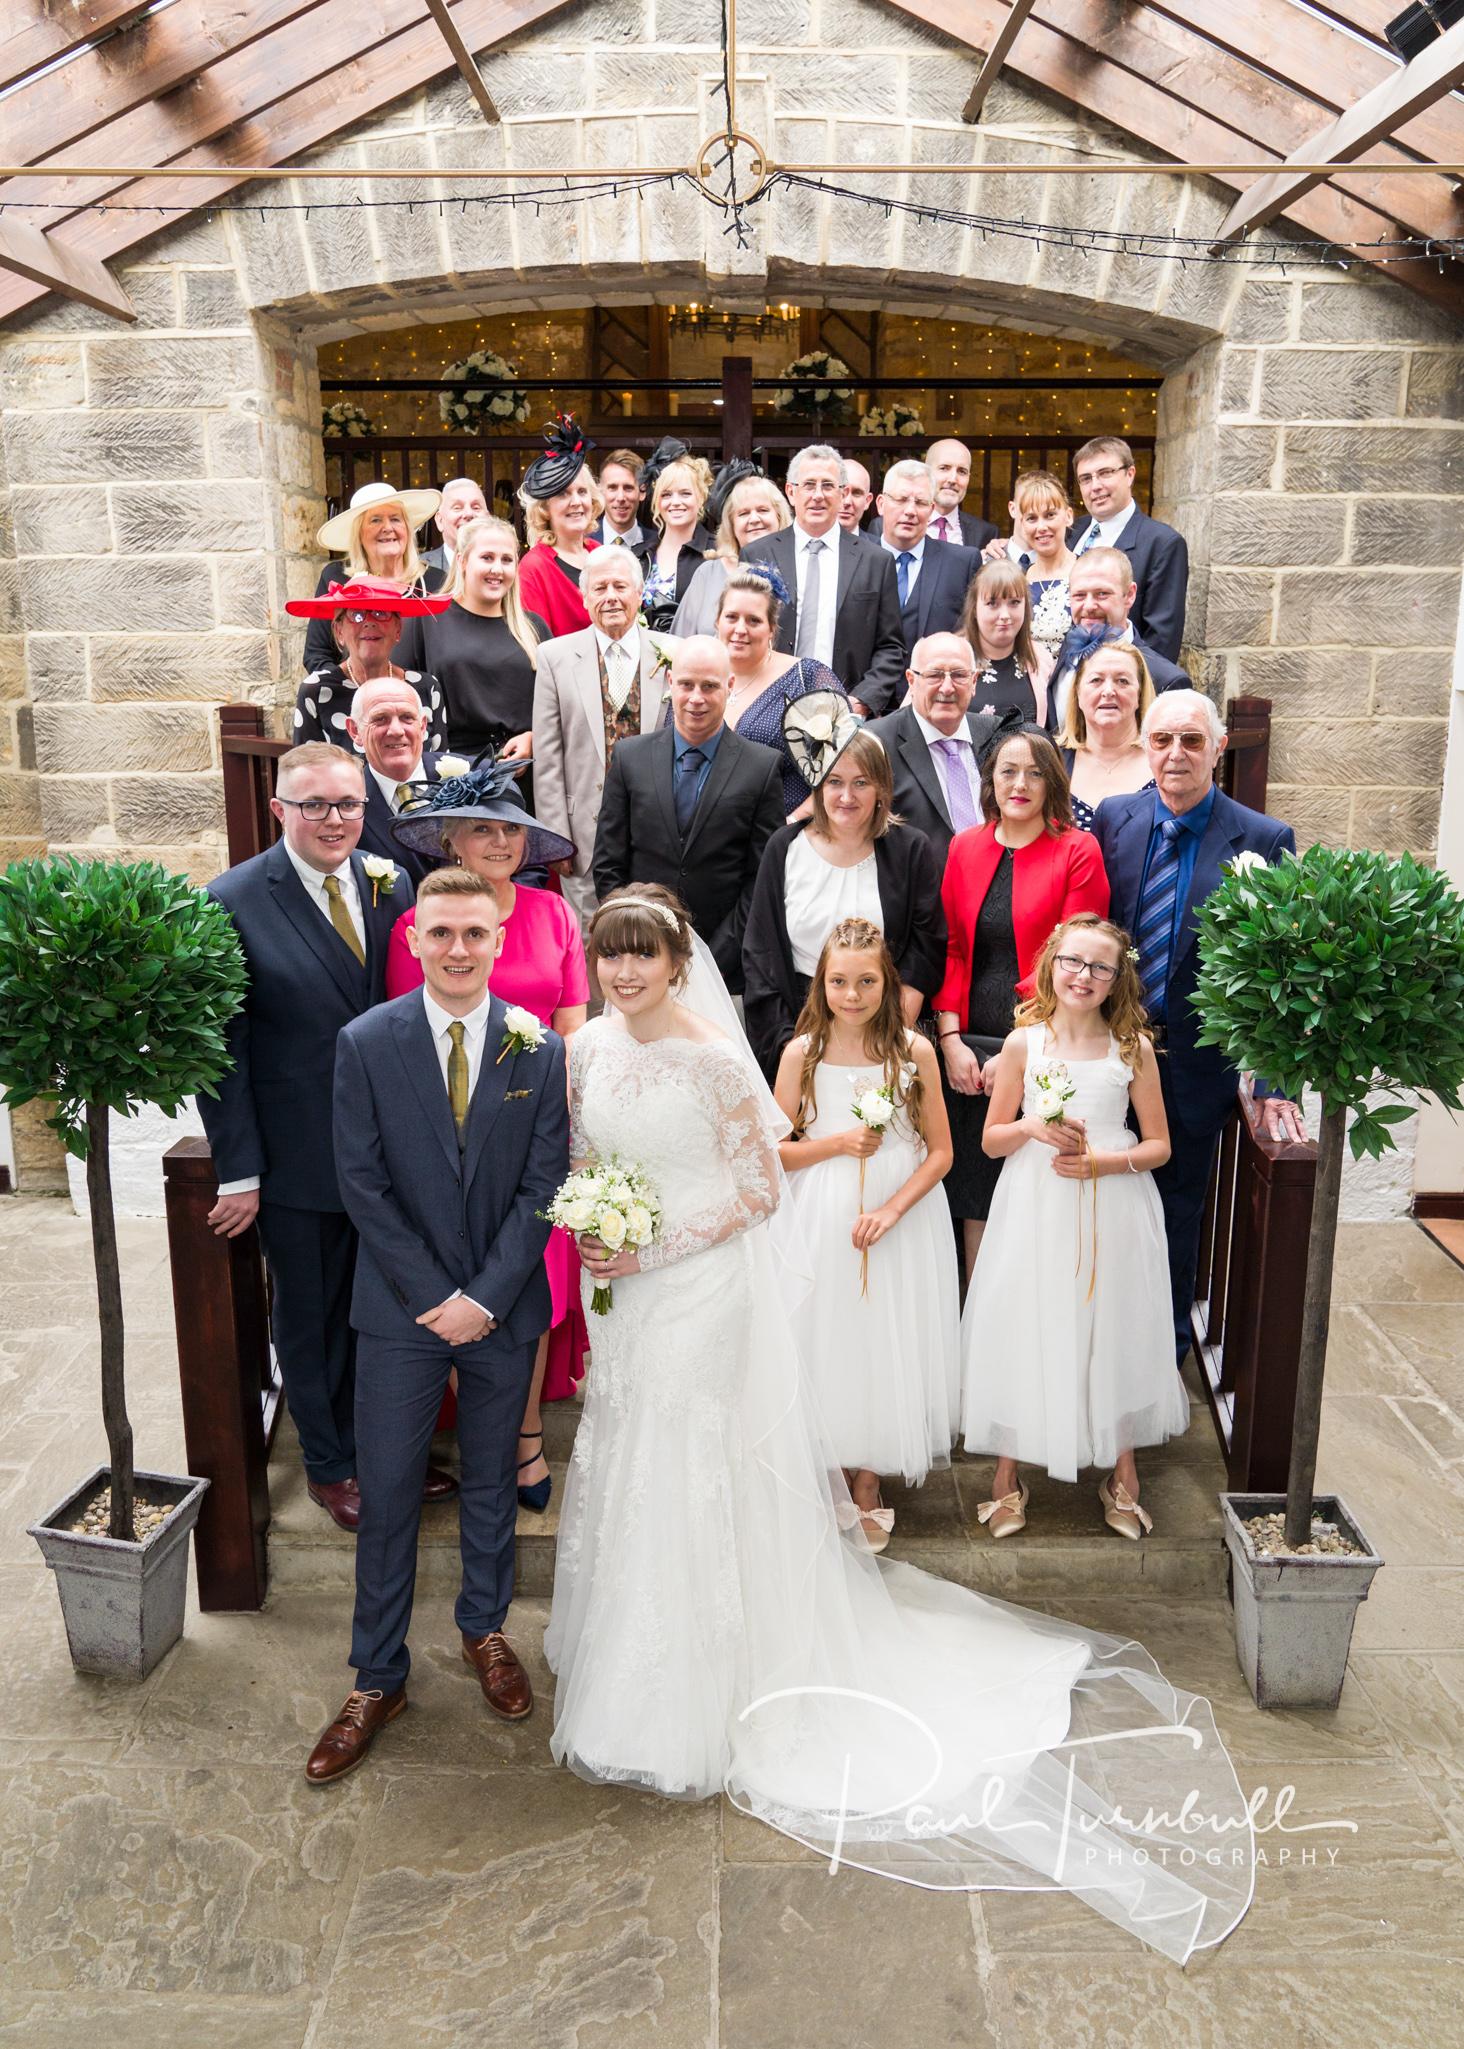 wedding-photographer-raven-hall-ravenscroft--scarborough-yorkshire-lucy-ryan-054.jpg